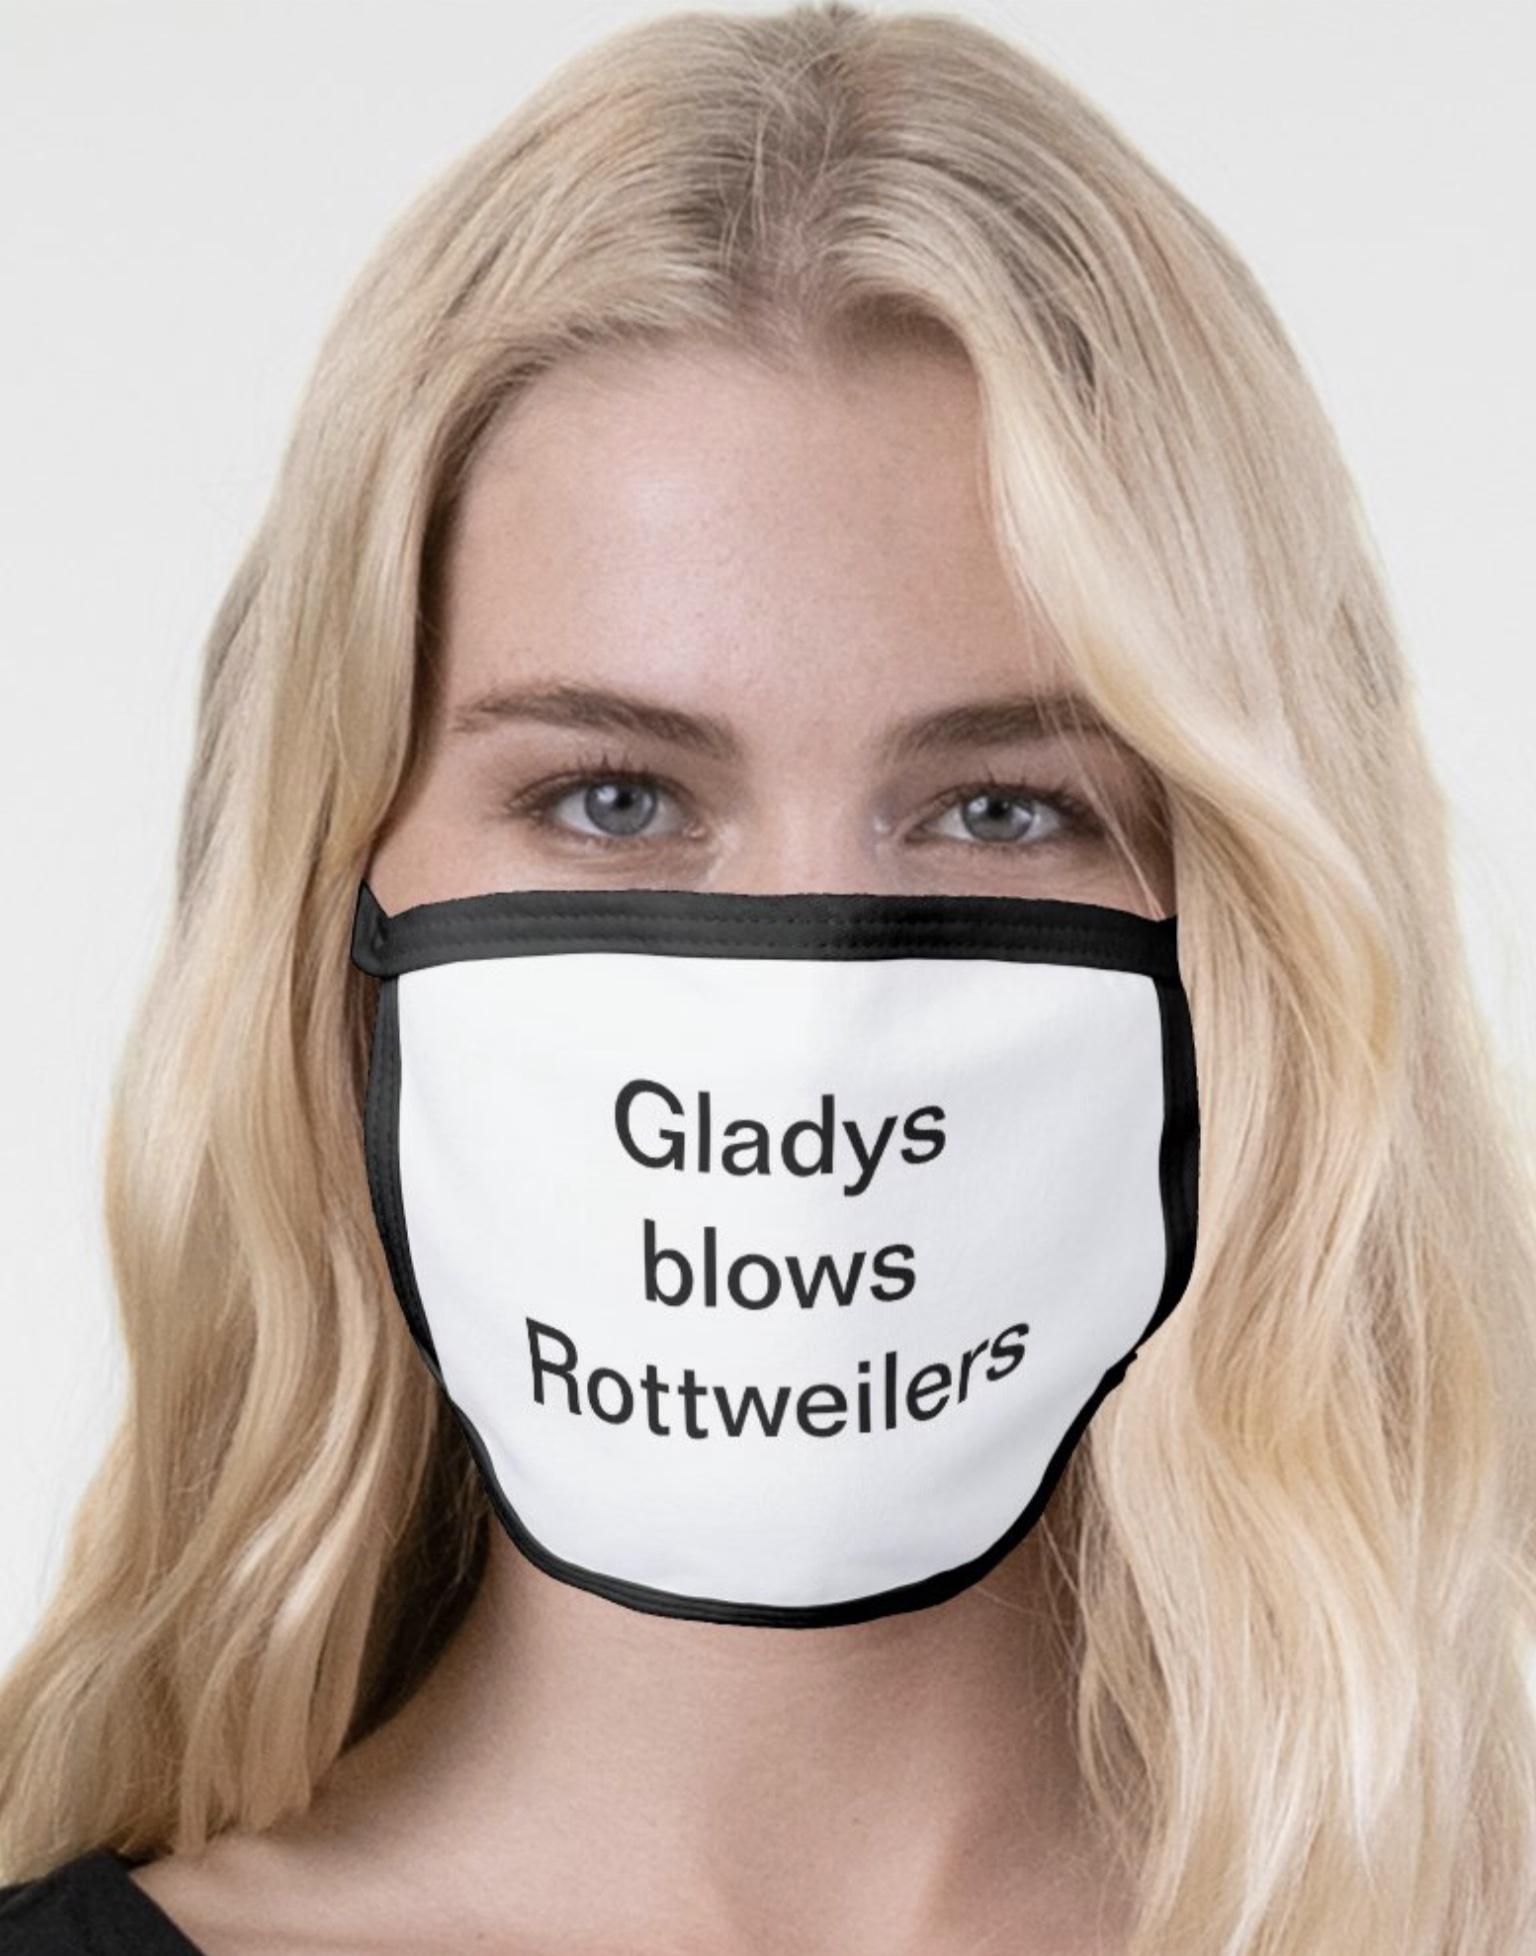 Gladys blows rottweilers